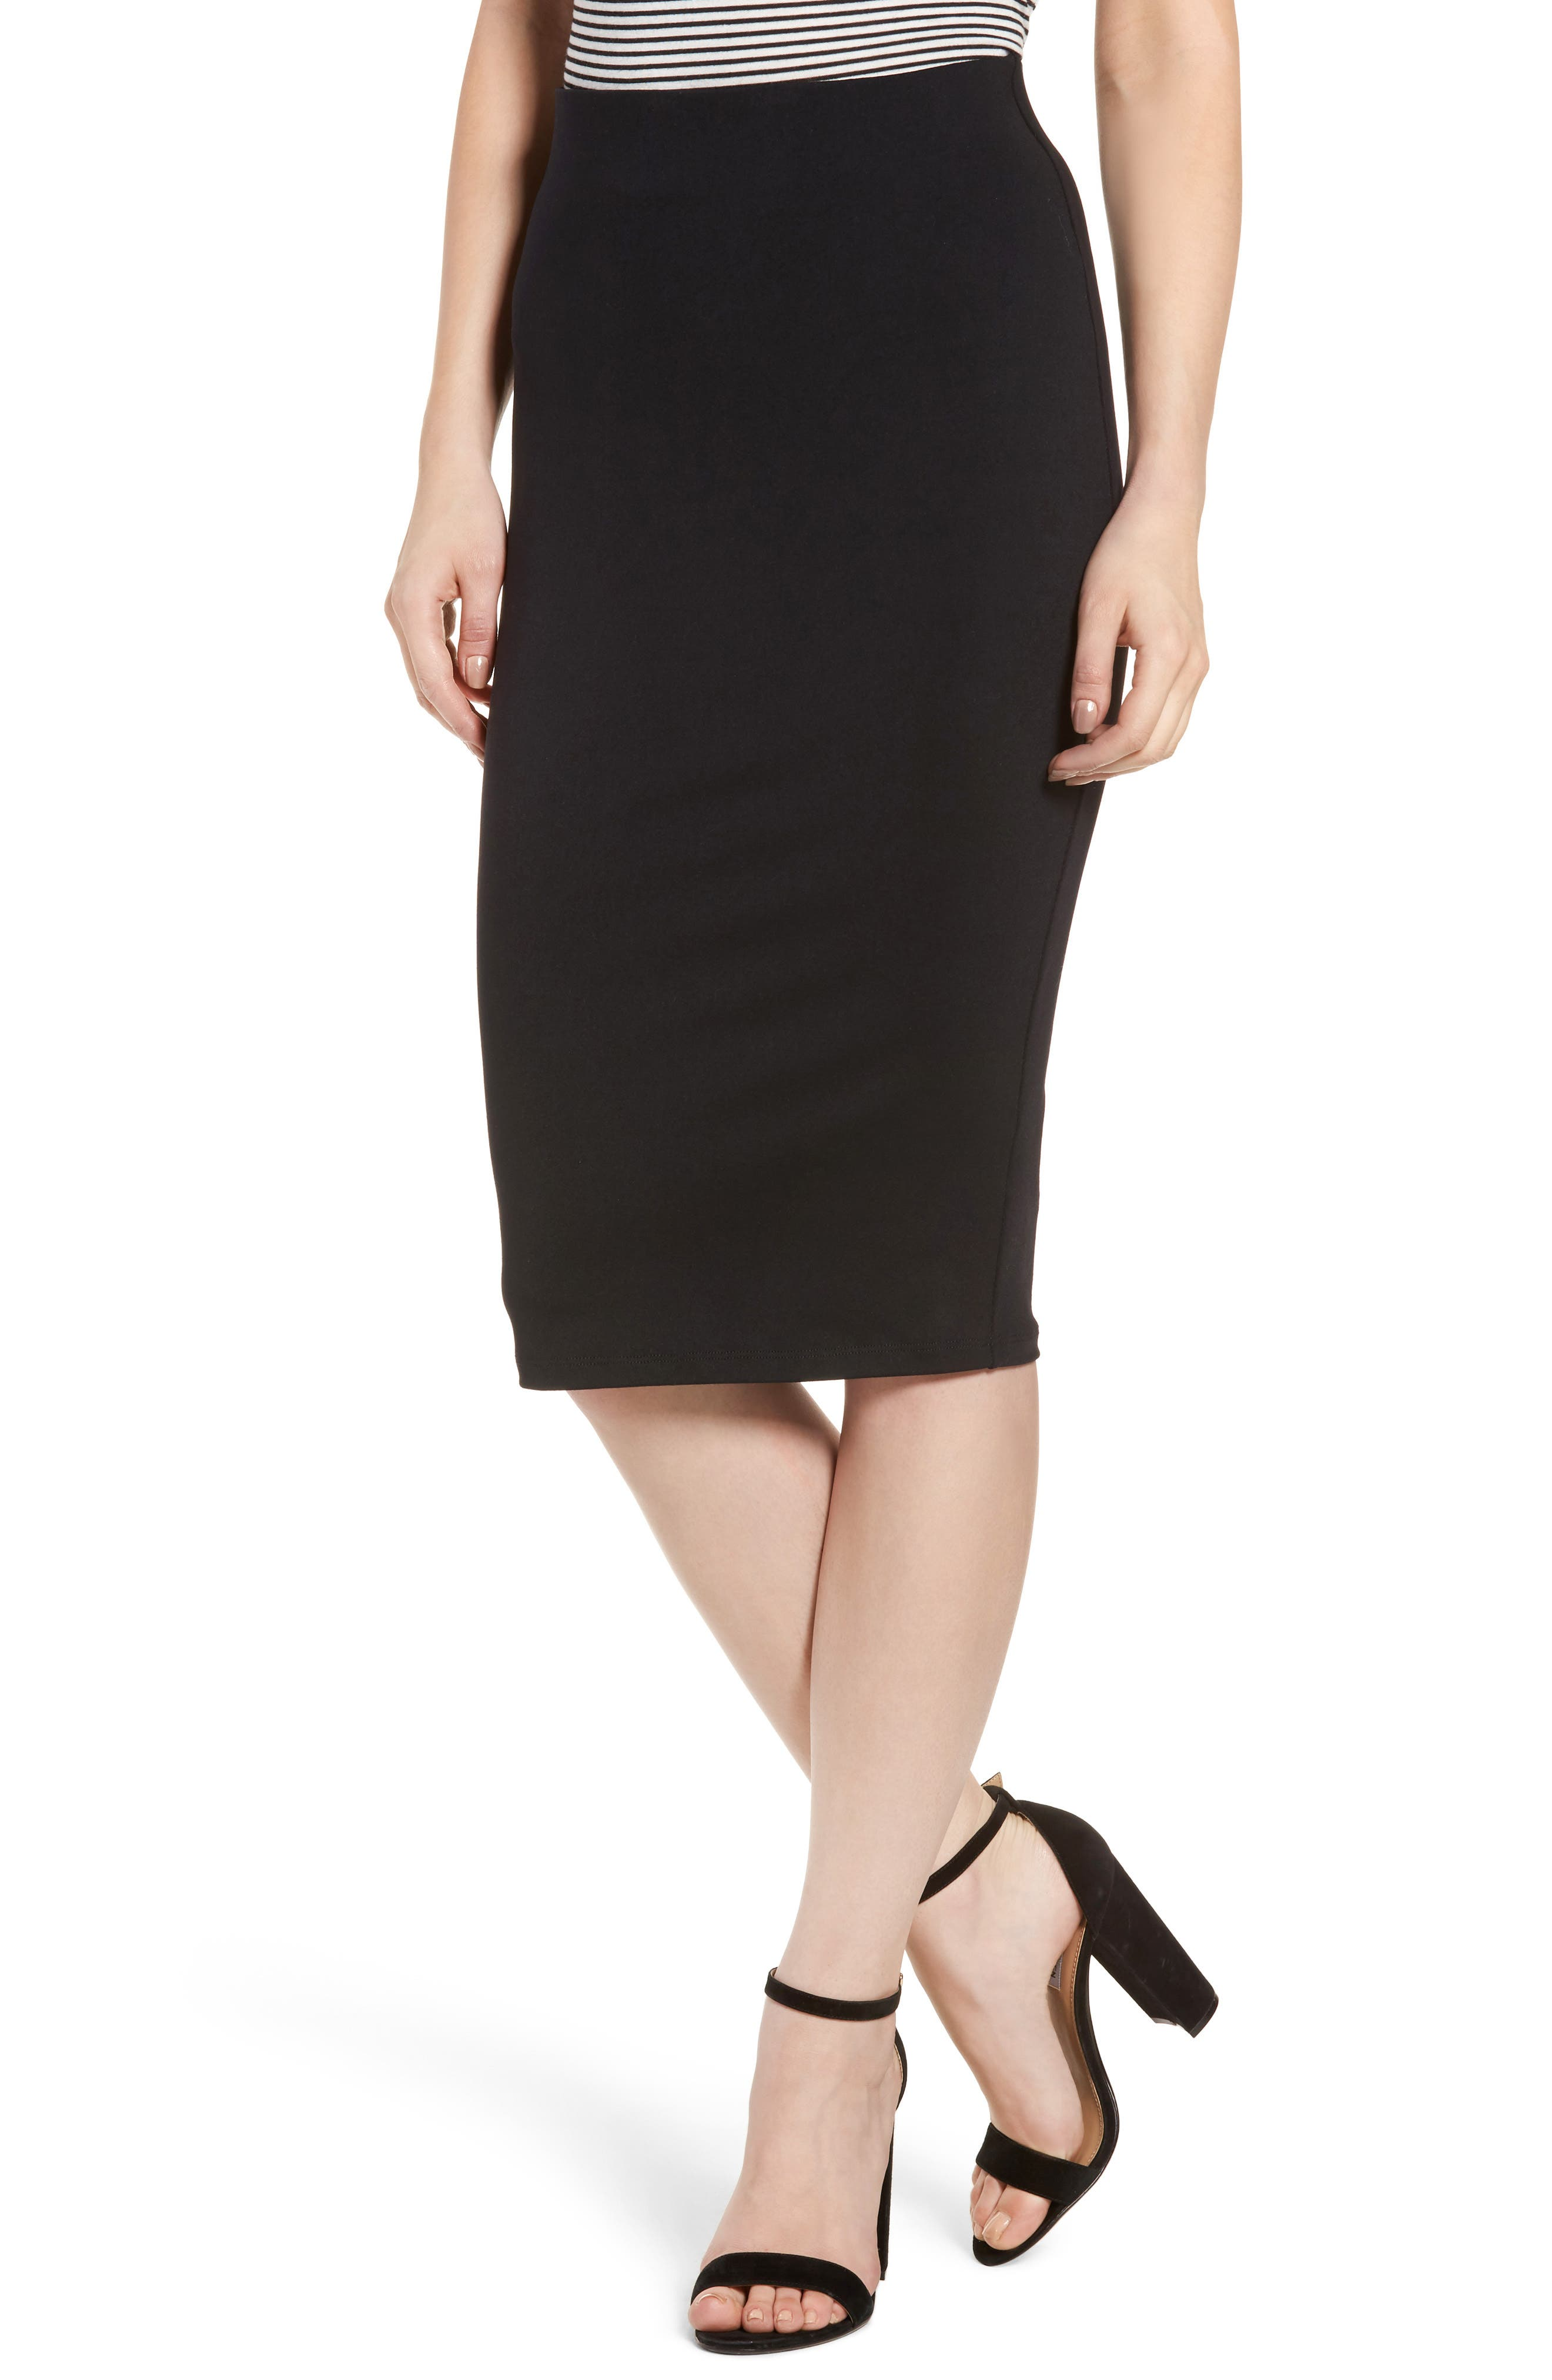 Alternate Image 1 Selected - David Lerner Tube High Rise Pencil Skirt